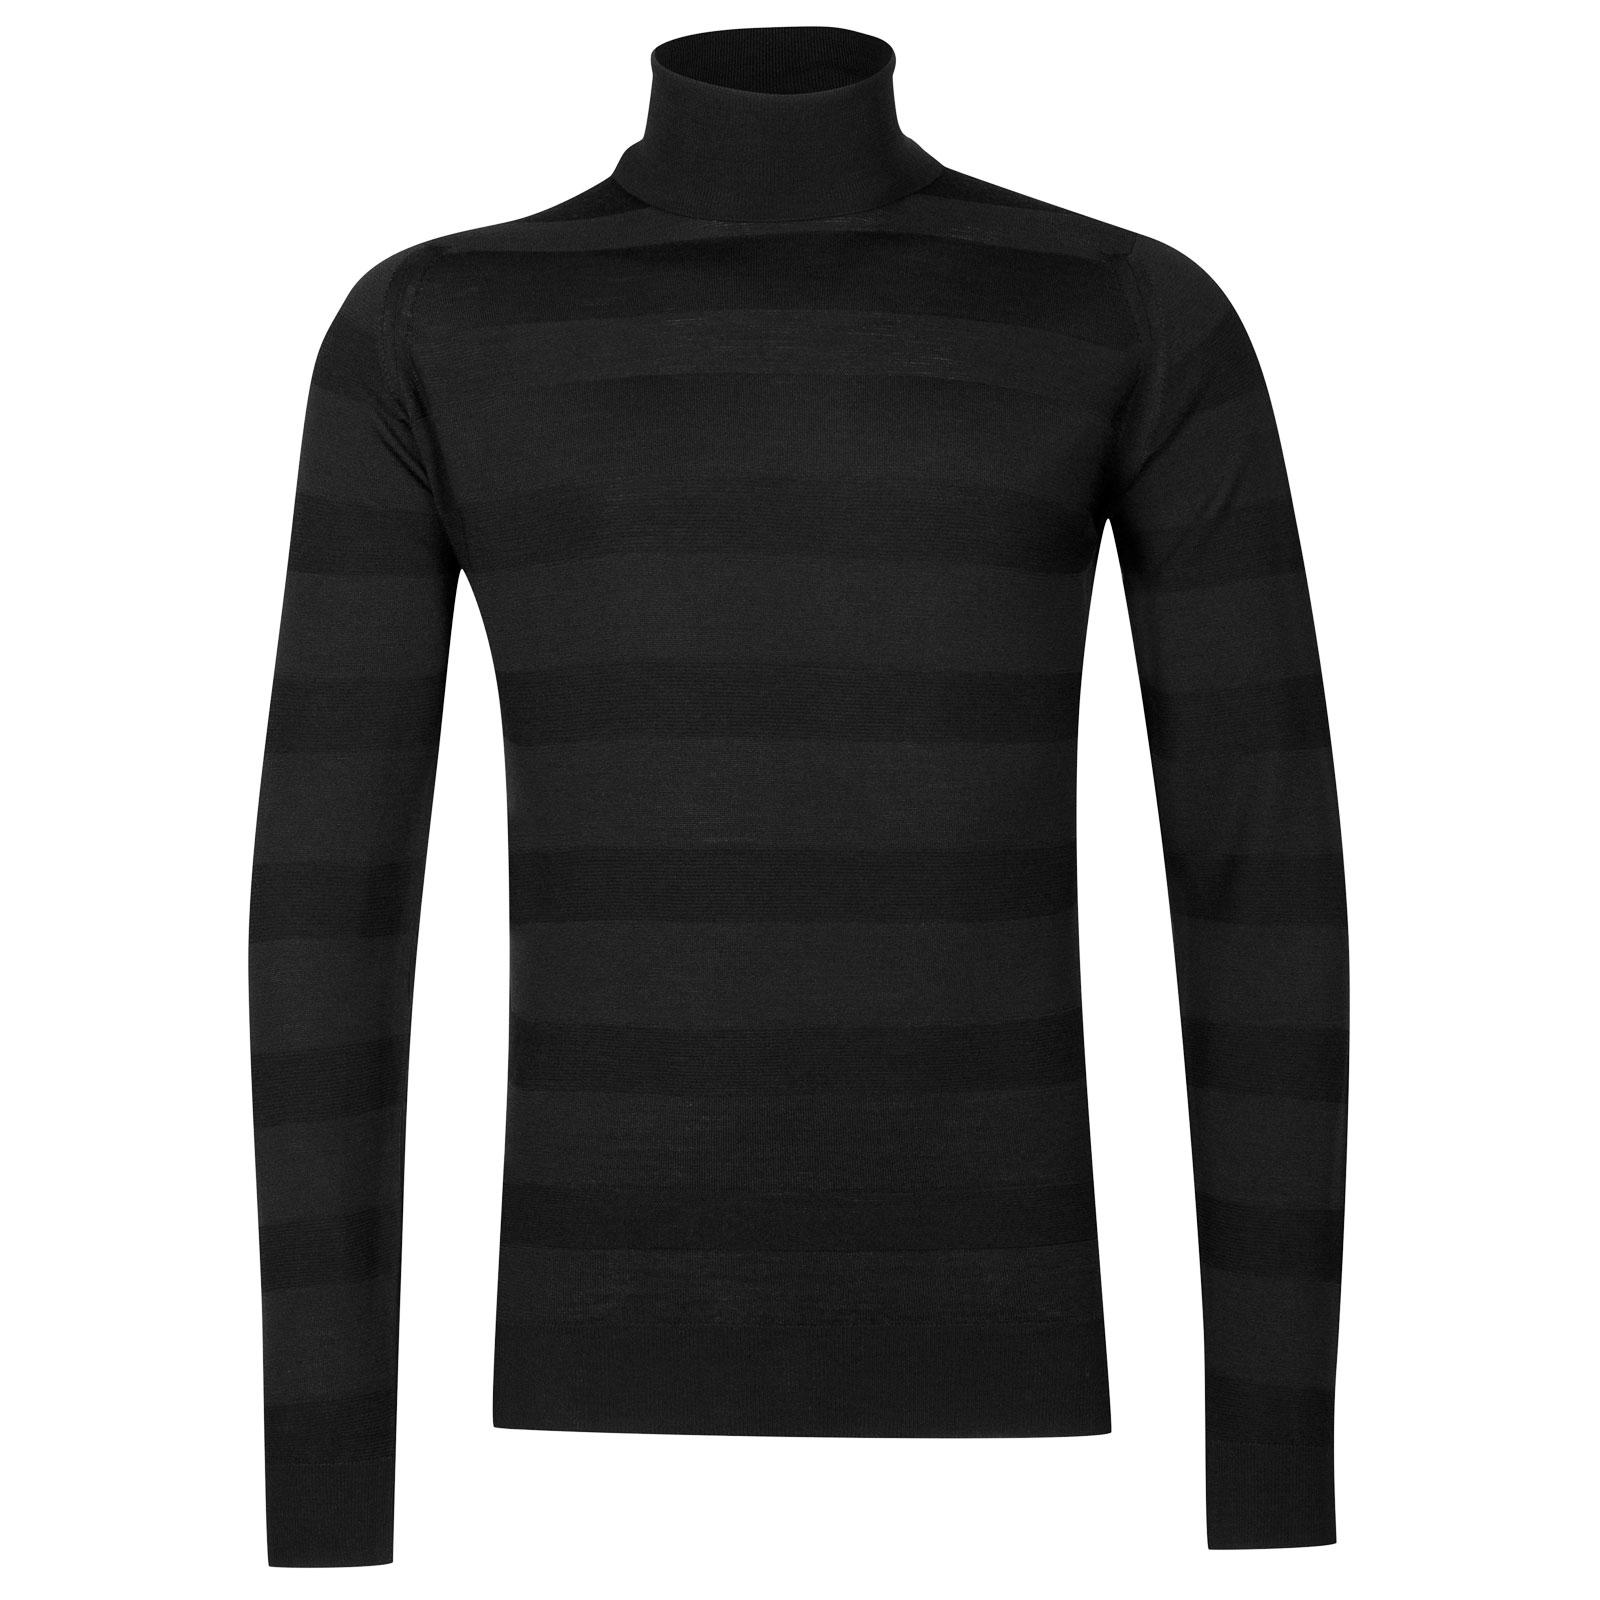 John Smedley ripley Merino Wool Pullover in Black-M